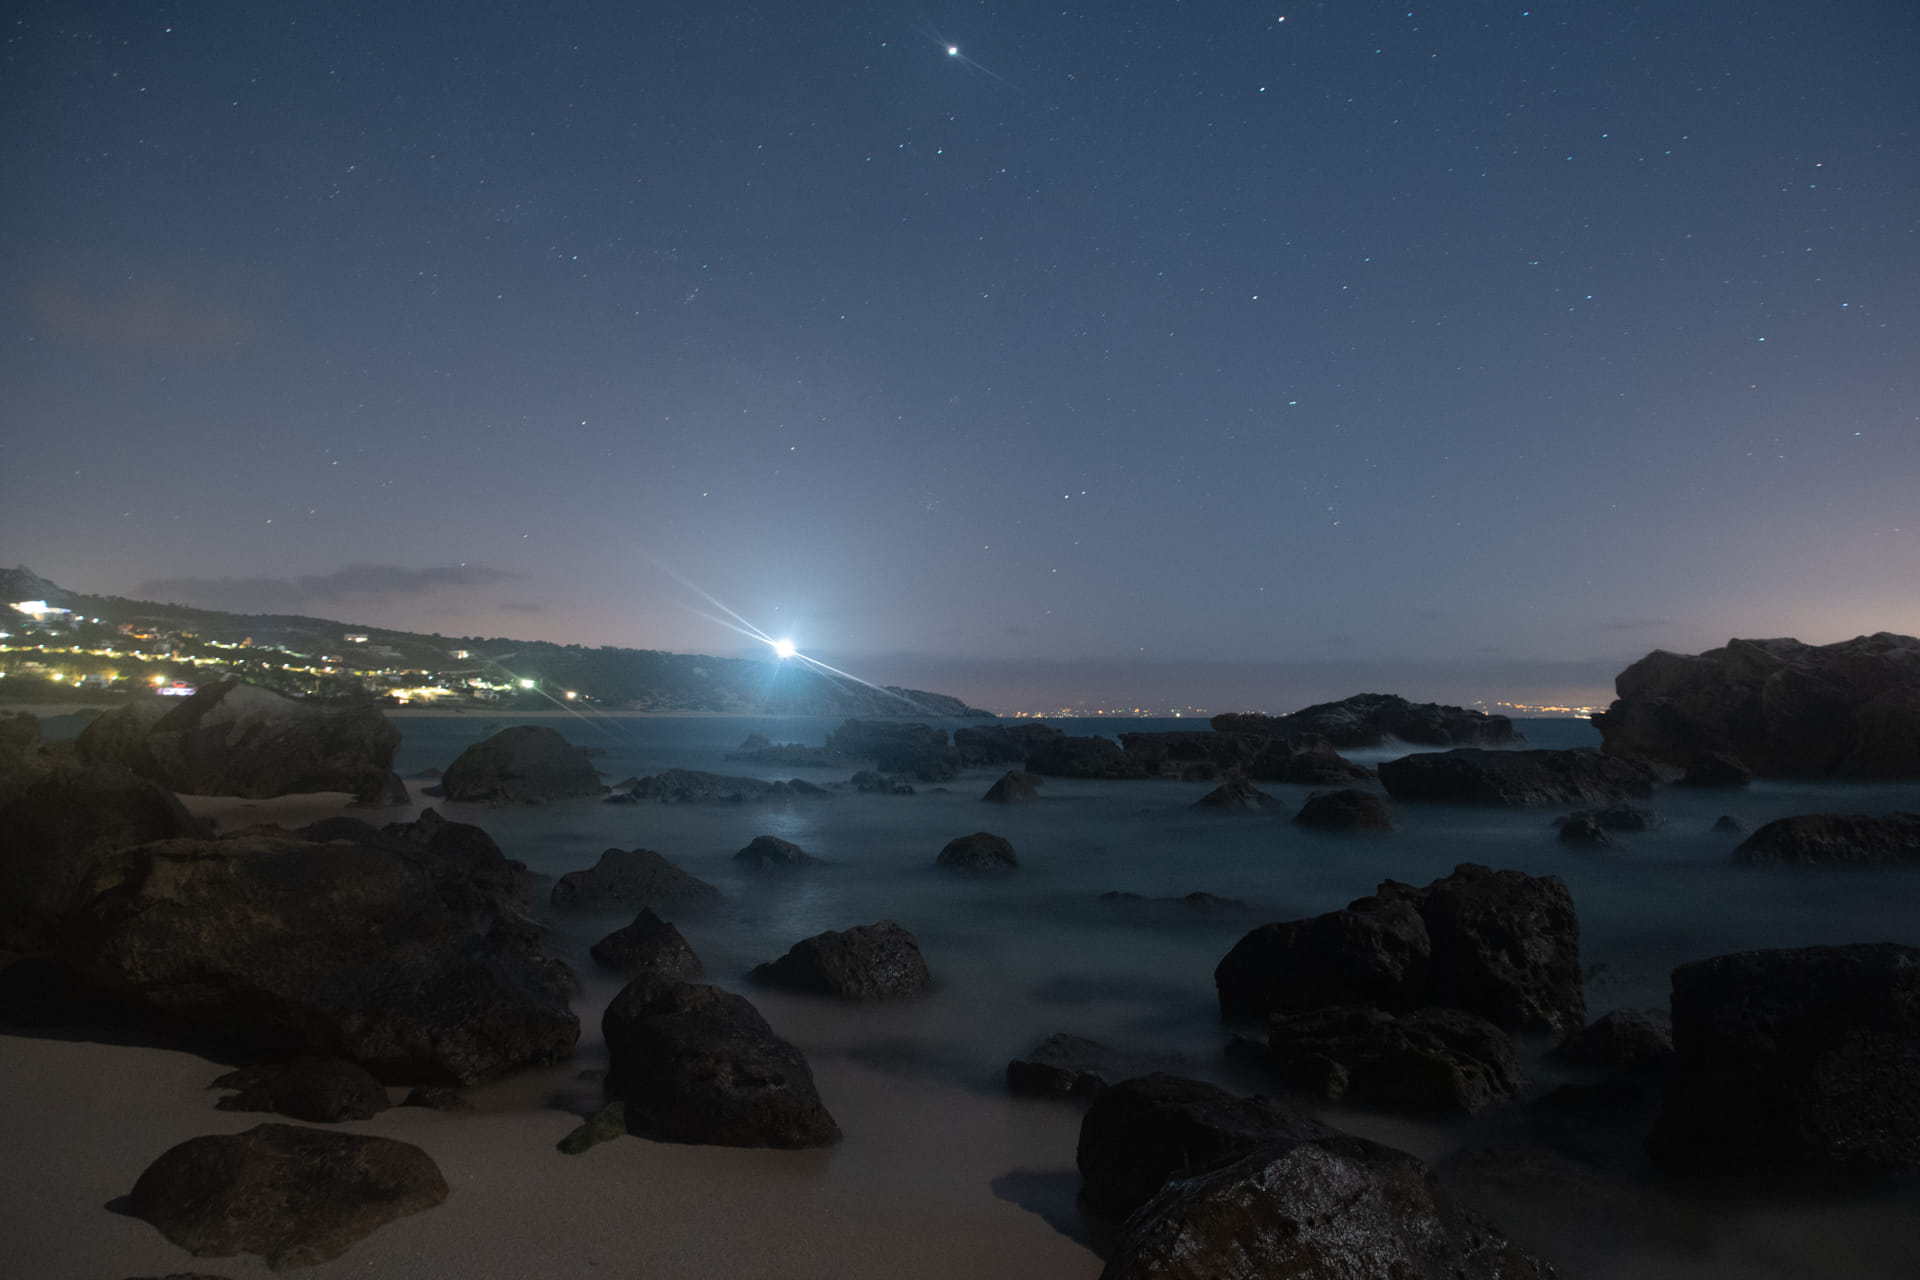 Noche en Zahara